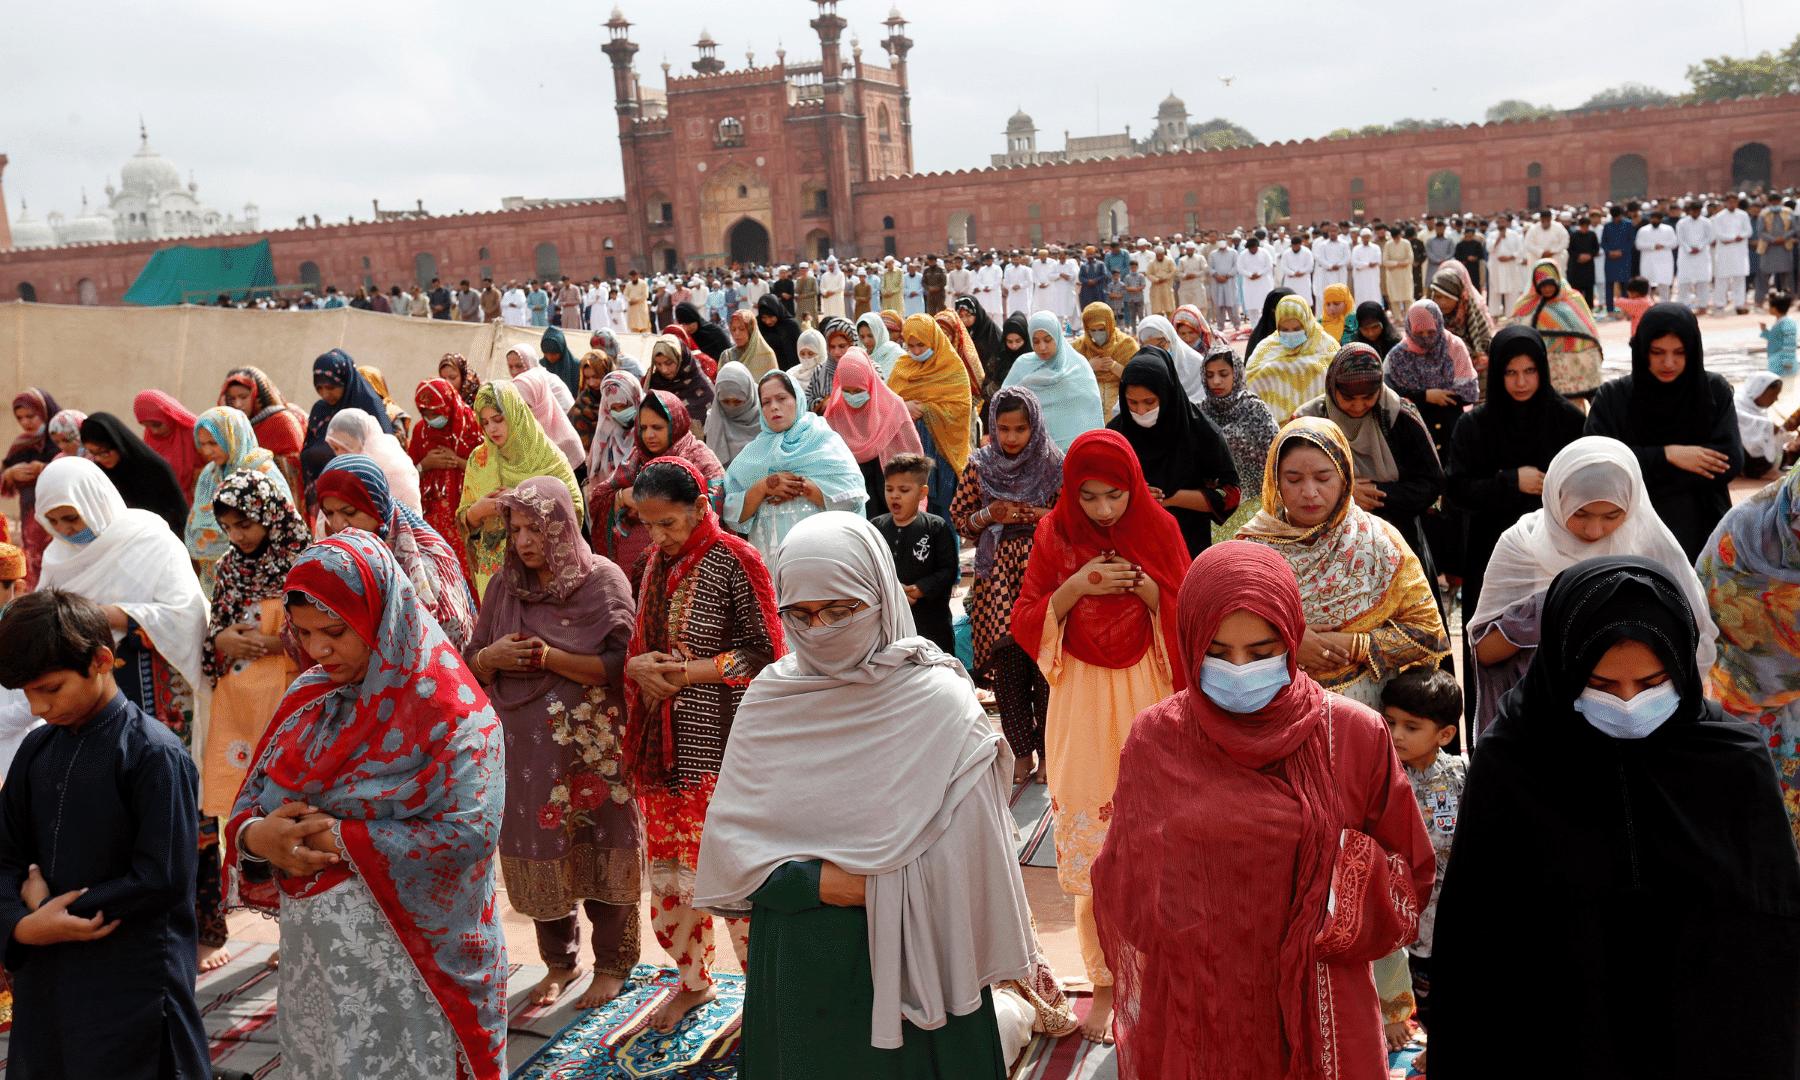 Women attend Eidul Azha prayers at the historical Badshahi mosque in Lahore. — AP